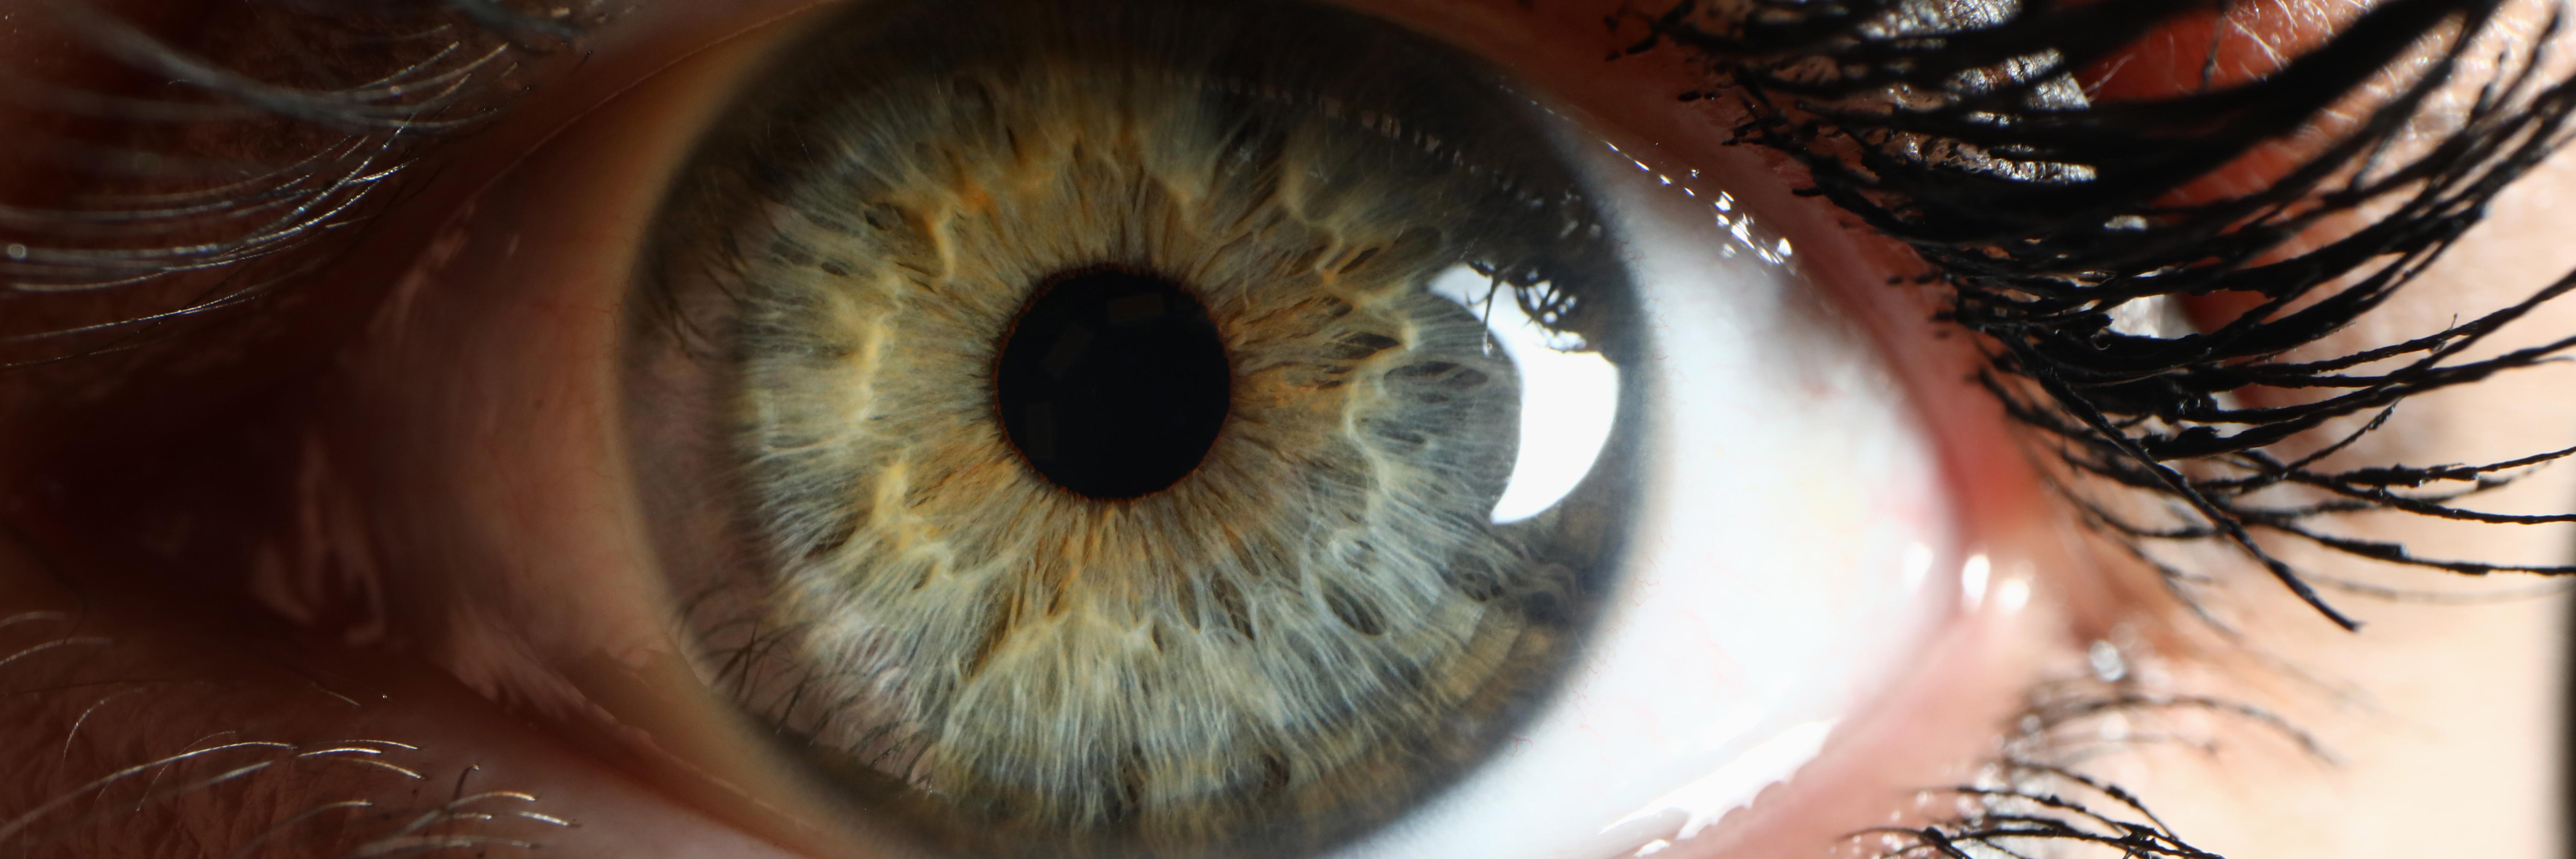 human-green-eye-supermacro-closeup-background